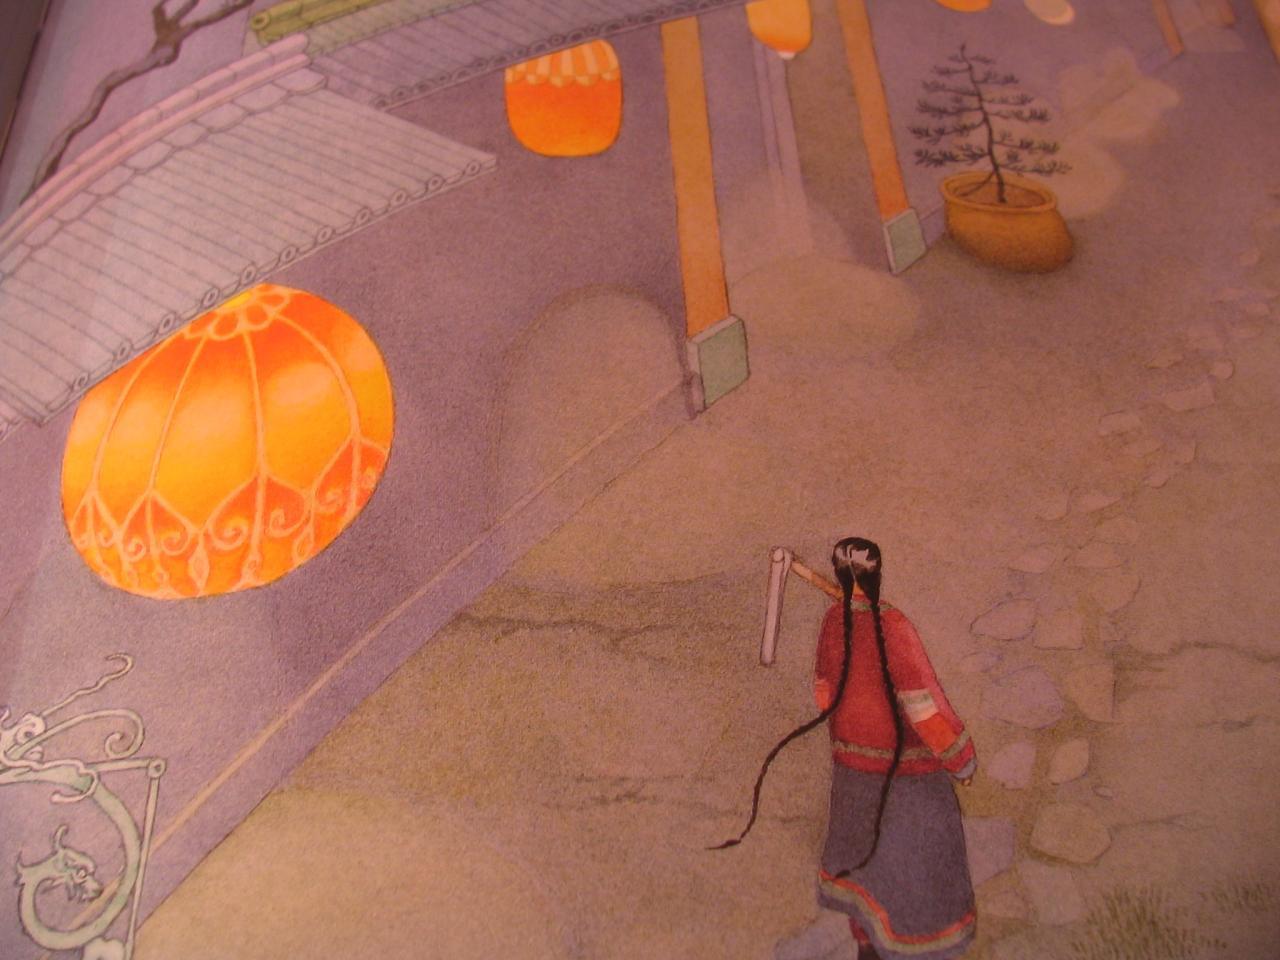 Tao/lanternes